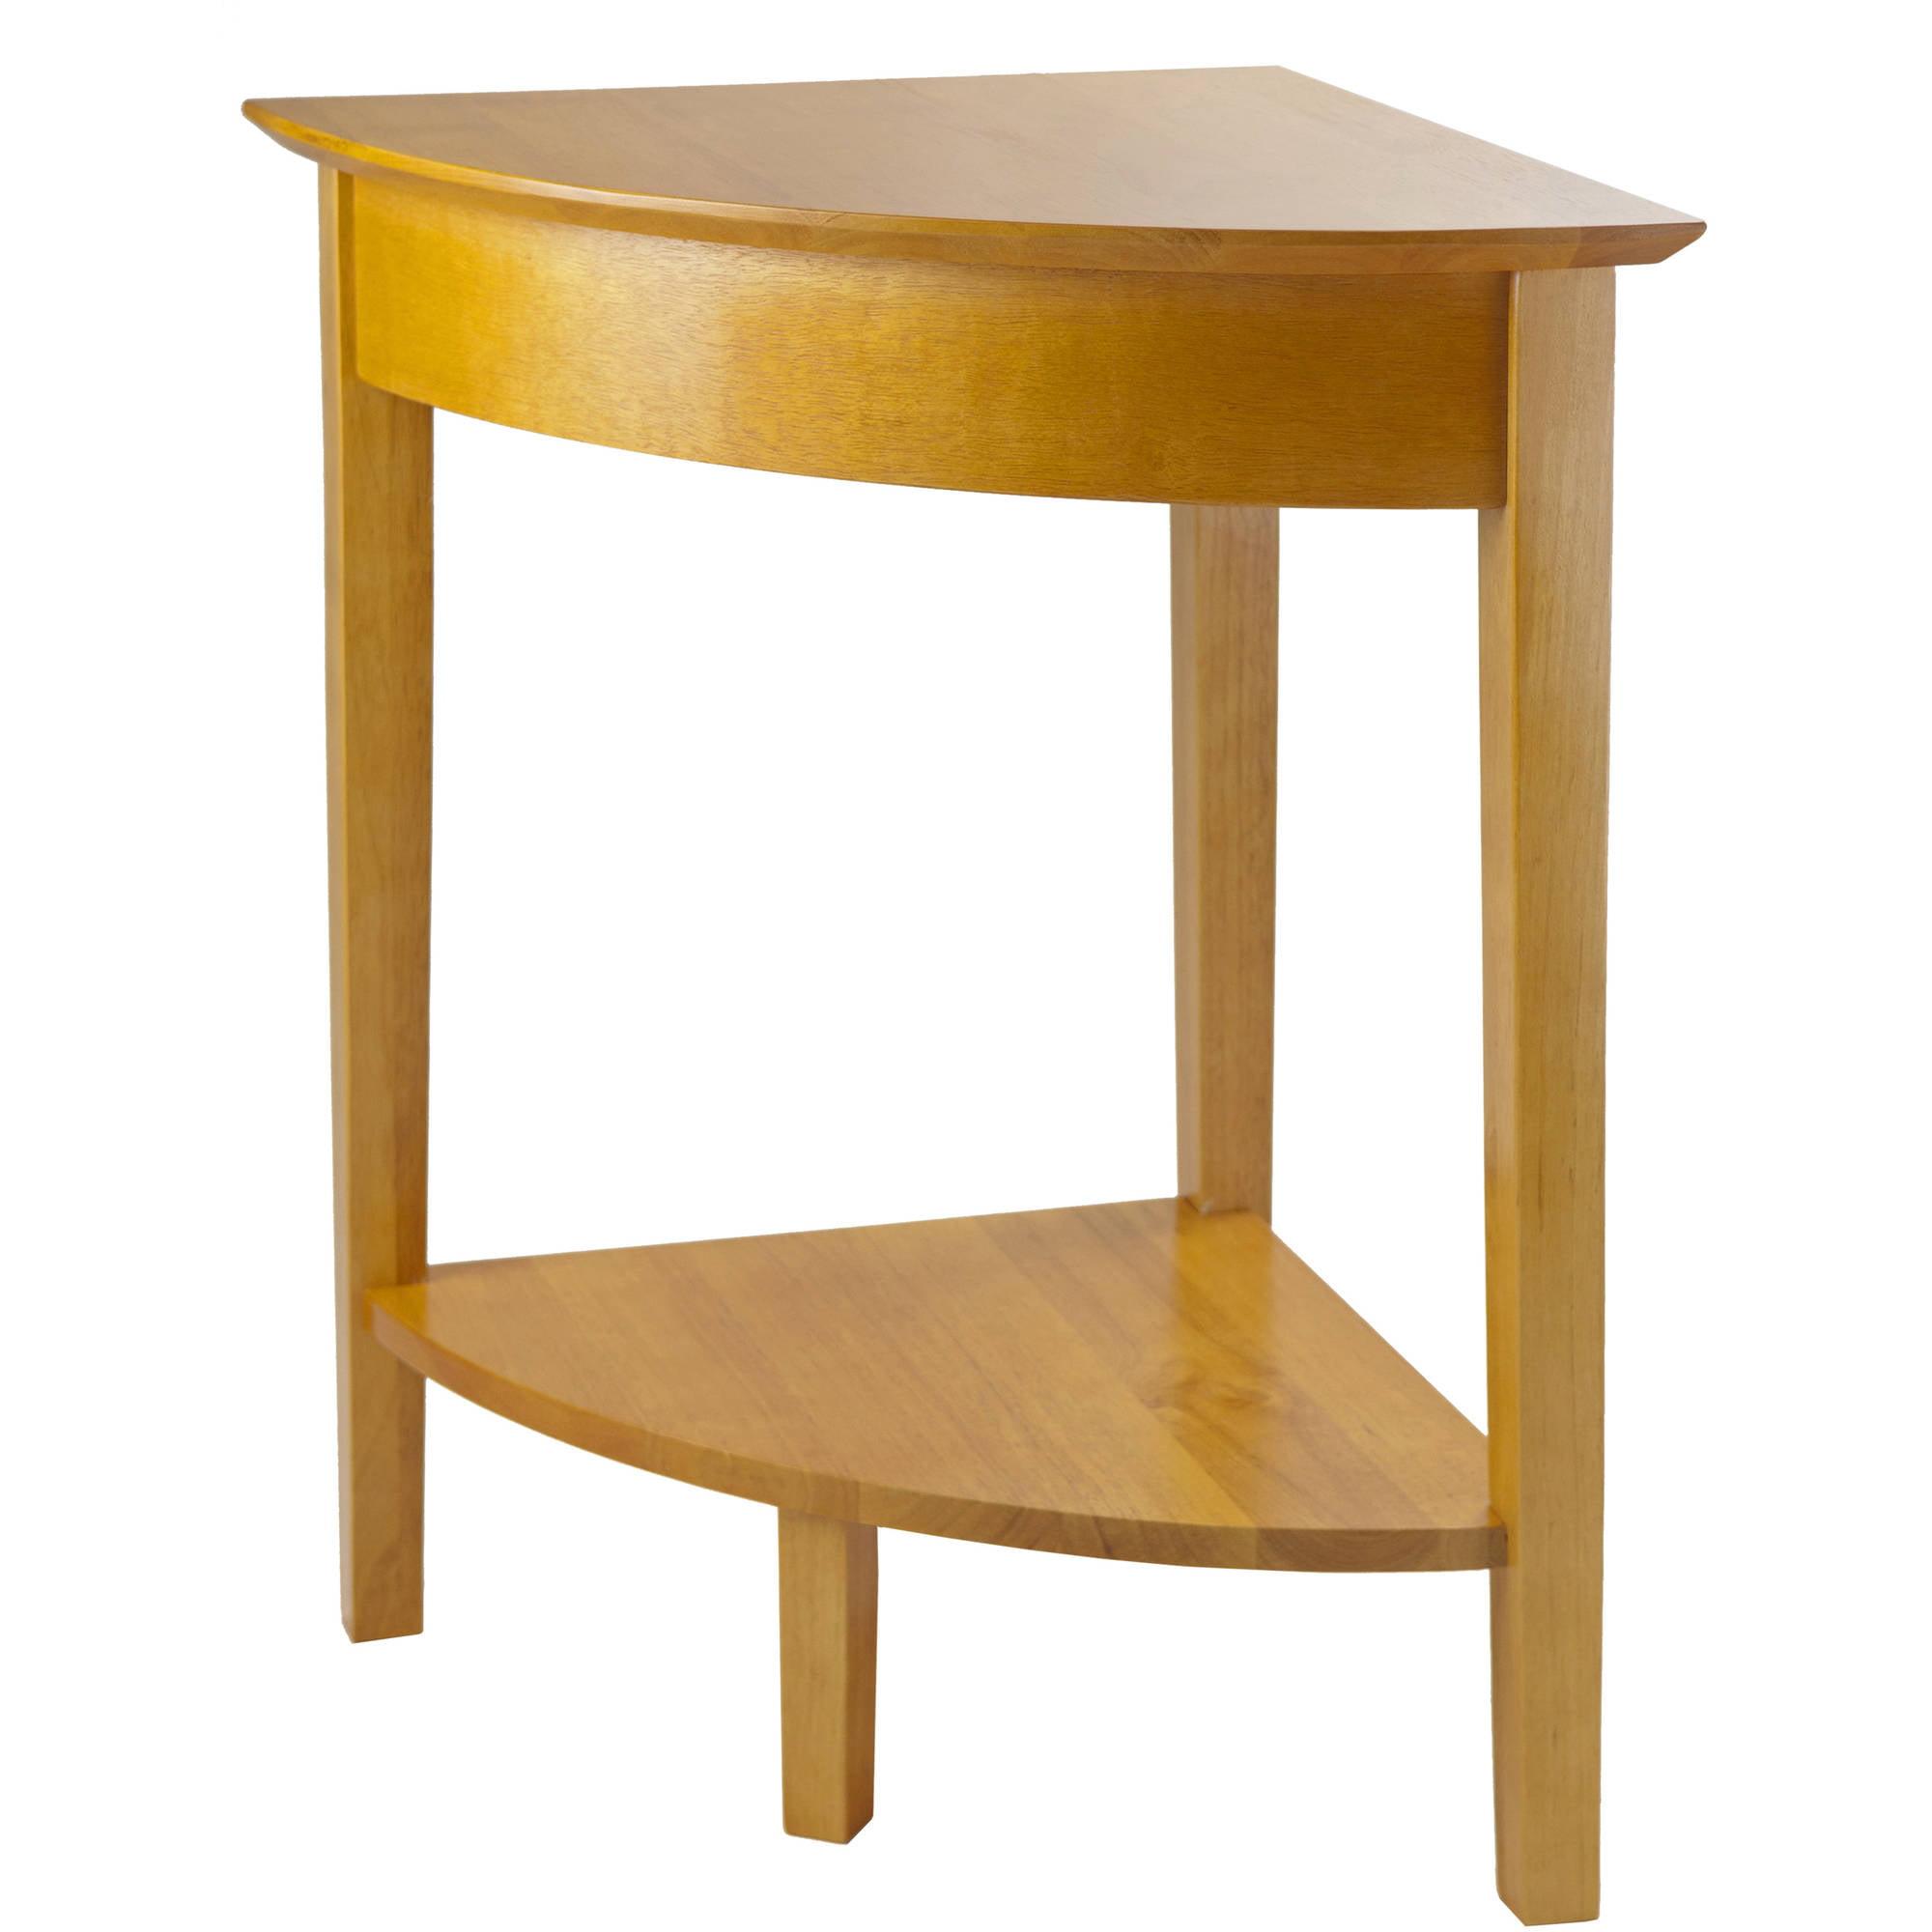 Walmart Table: Studio Home Office Corner Table